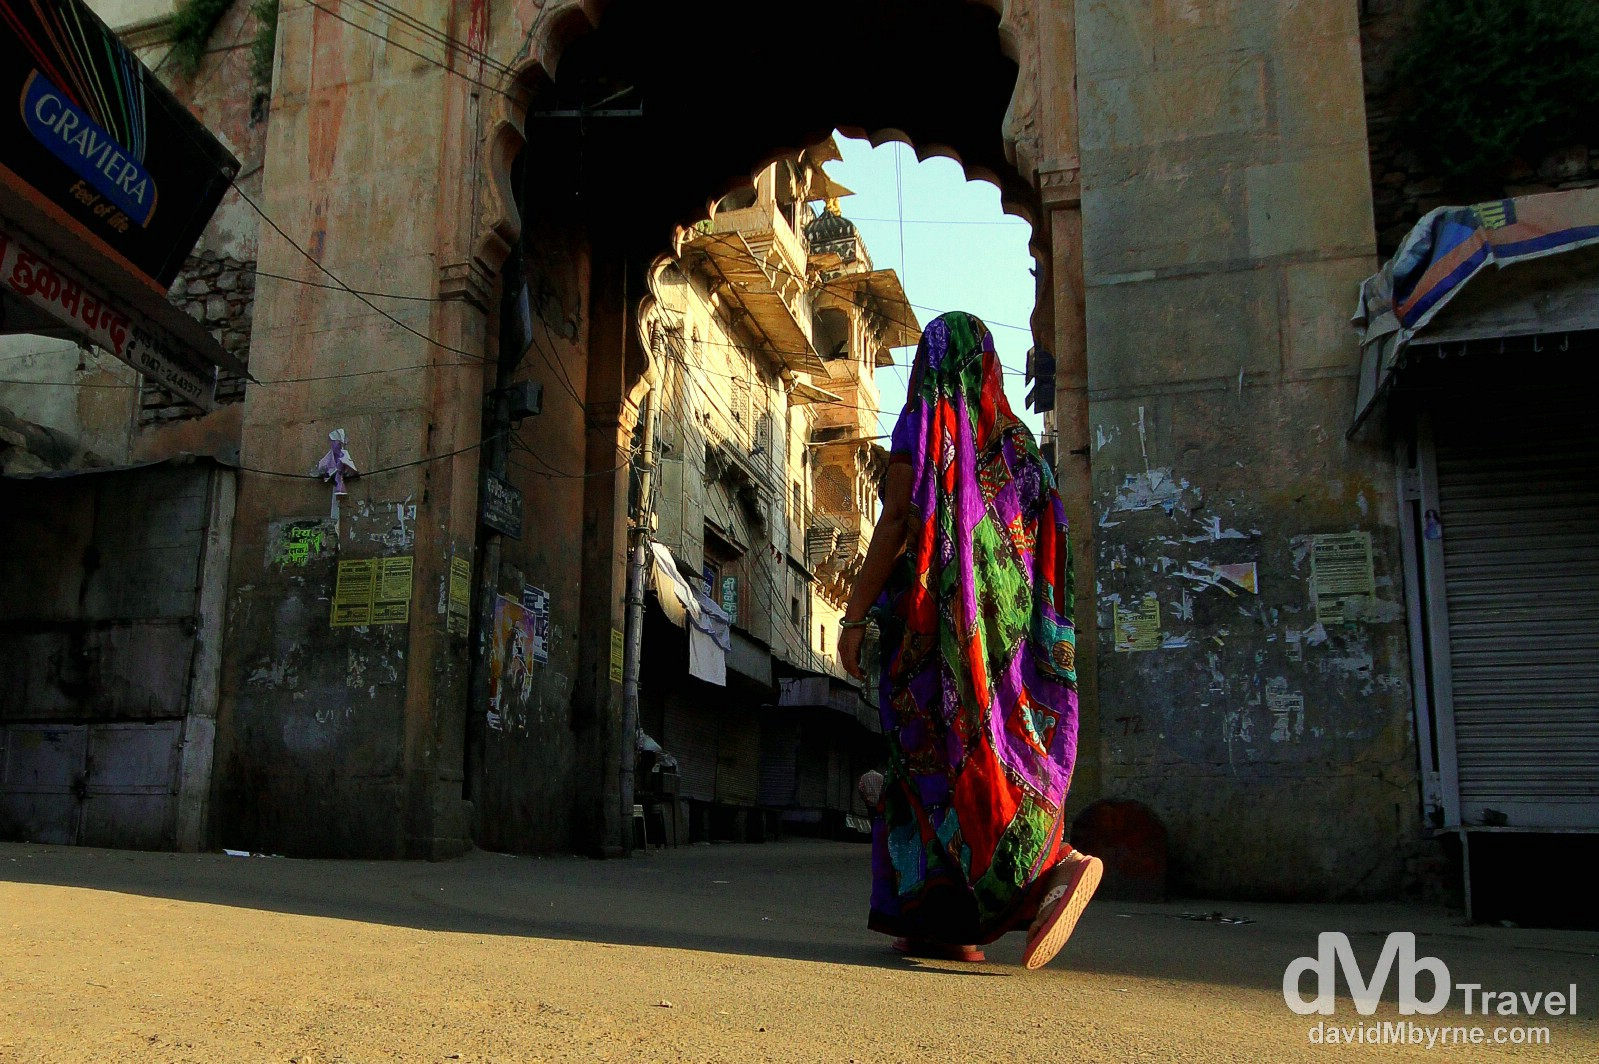 Sunrise on the streets of Bundi, Rajasthan, India. October 2nd 2012.